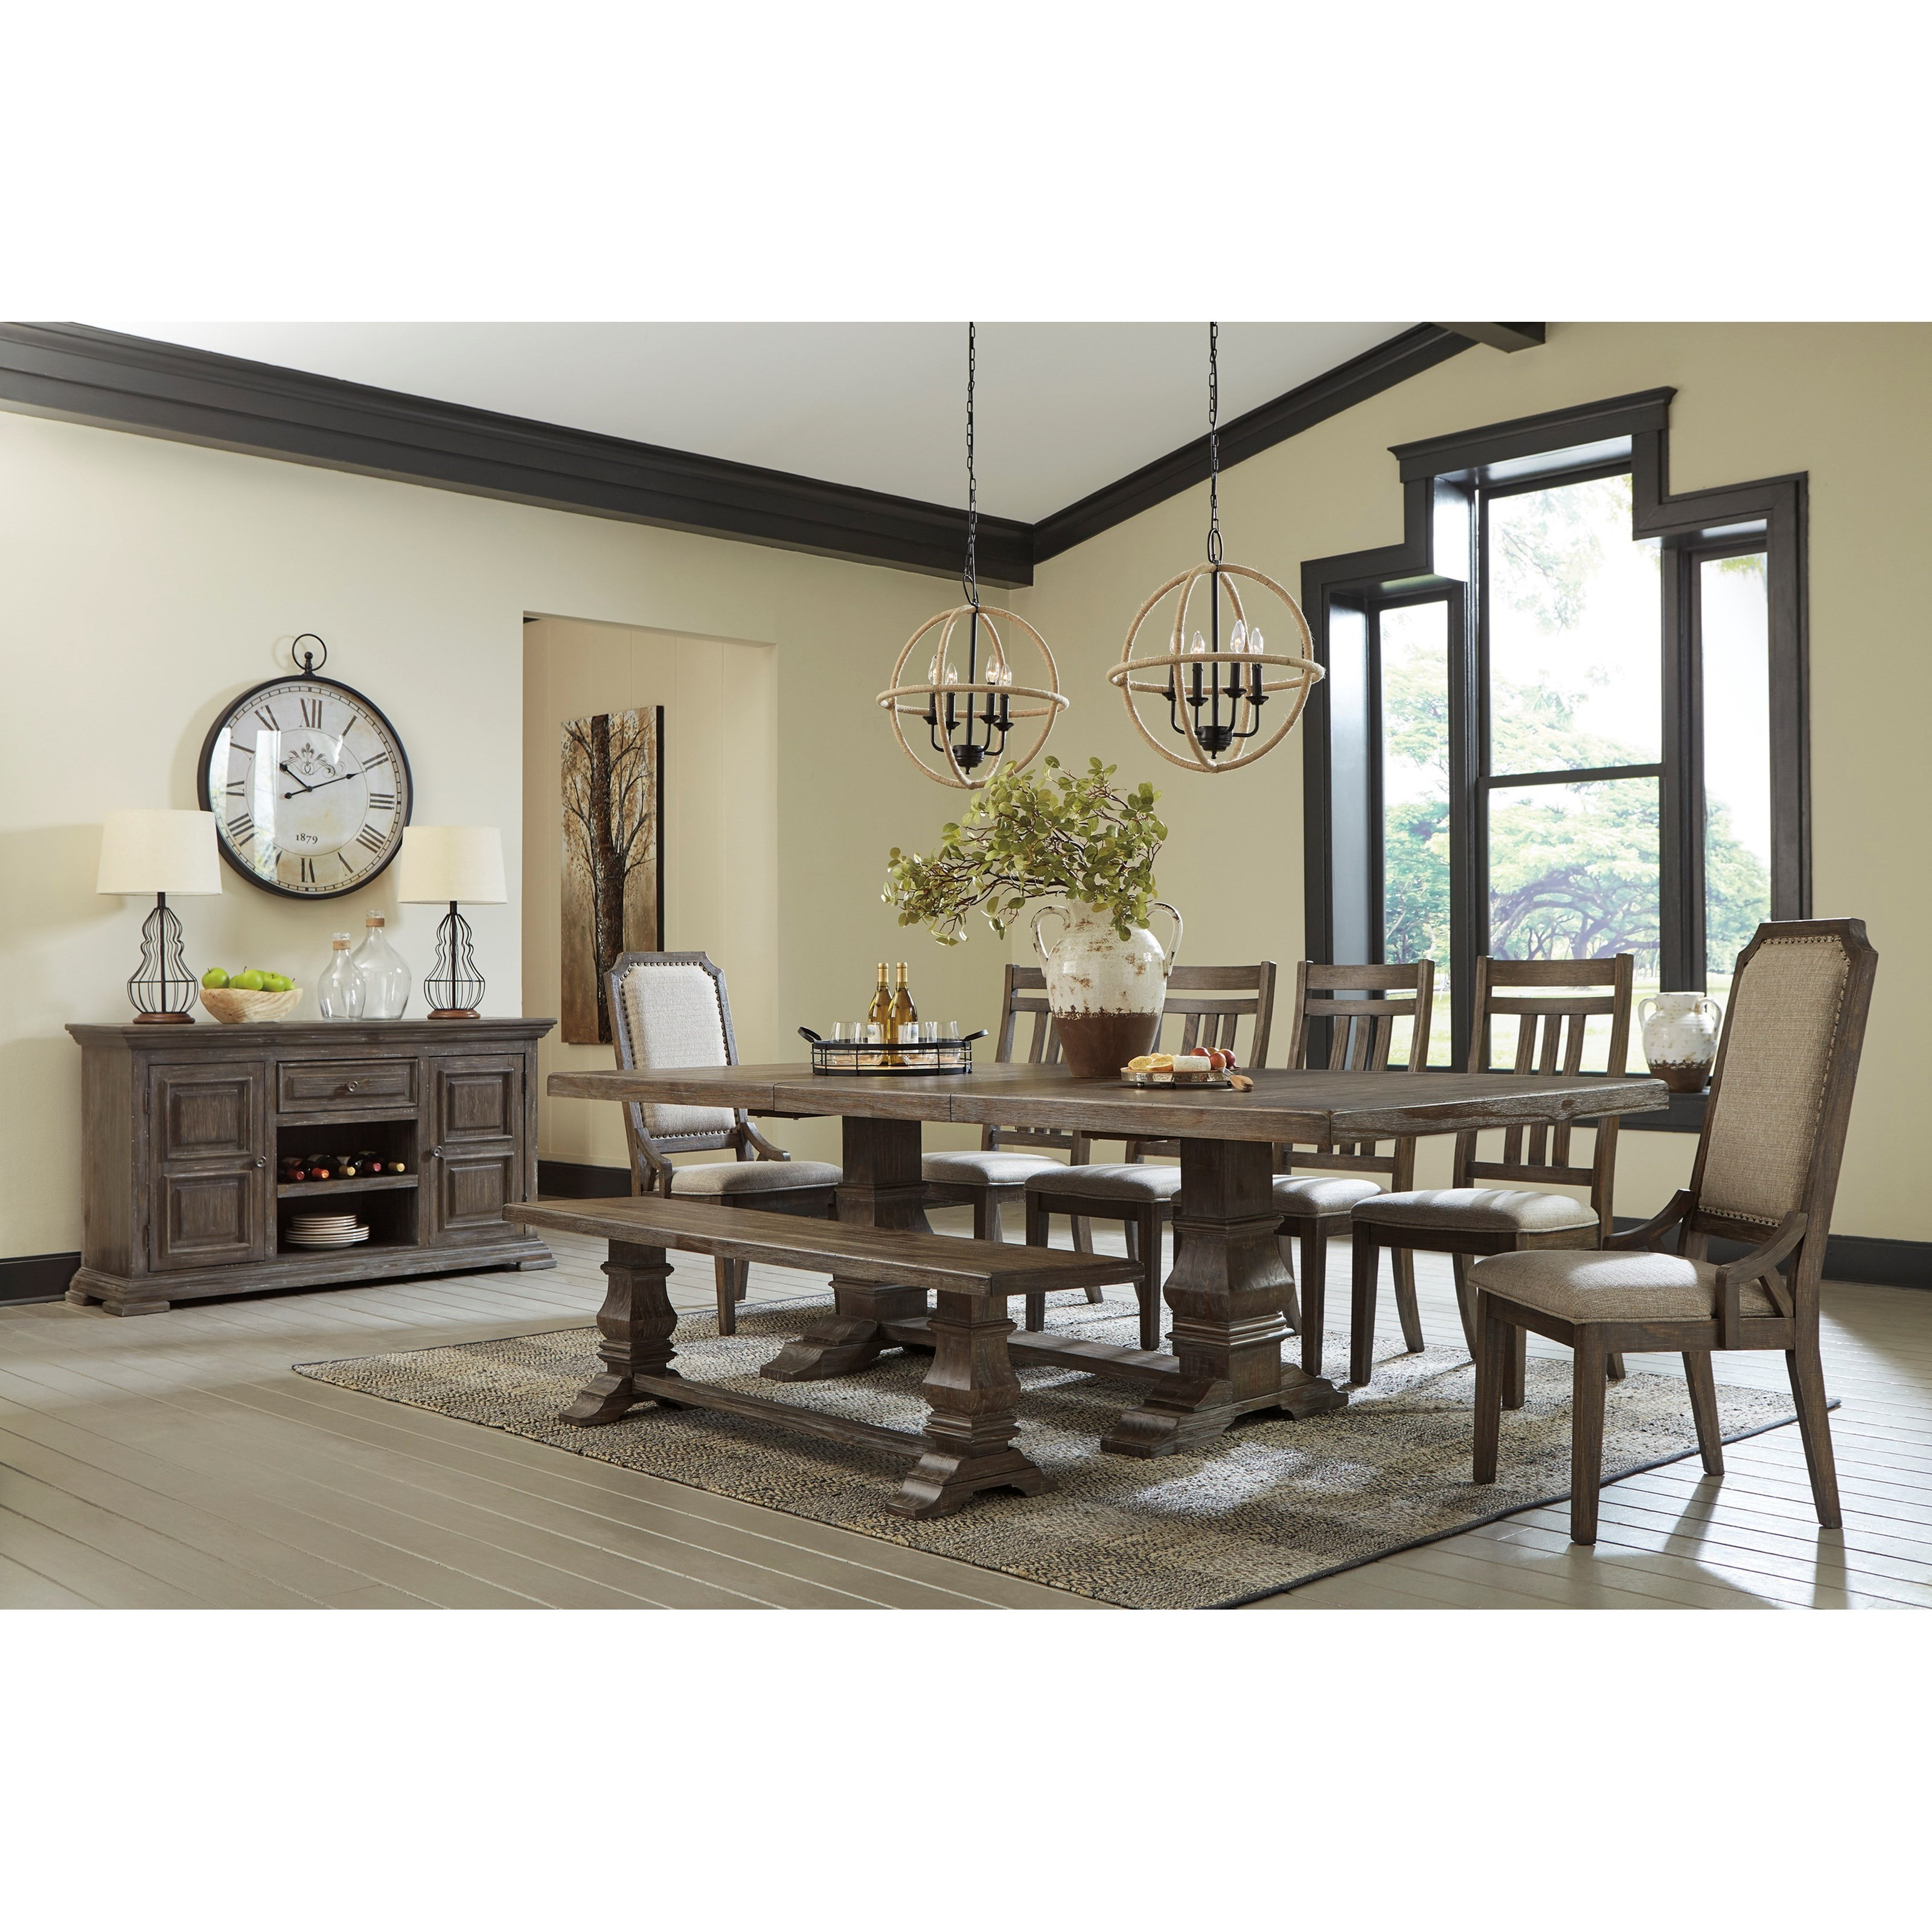 Wyndahl Dining Room Group by Ashley (Signature Design) at Johnny Janosik